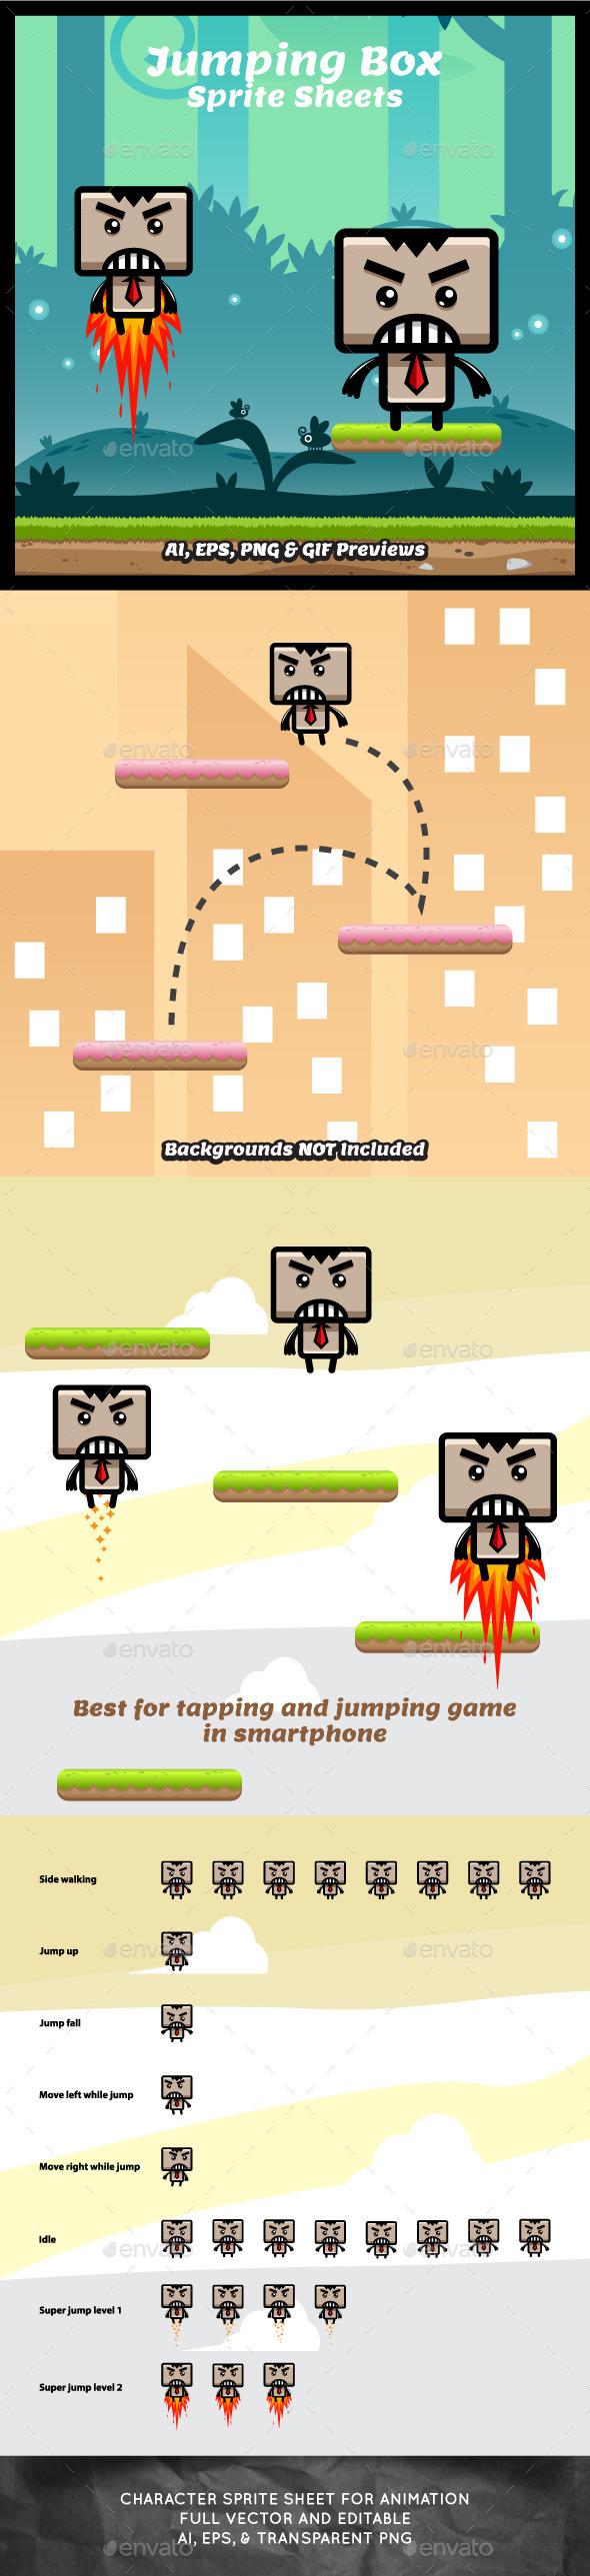 Jumping Box Game Character Sprite Sheets